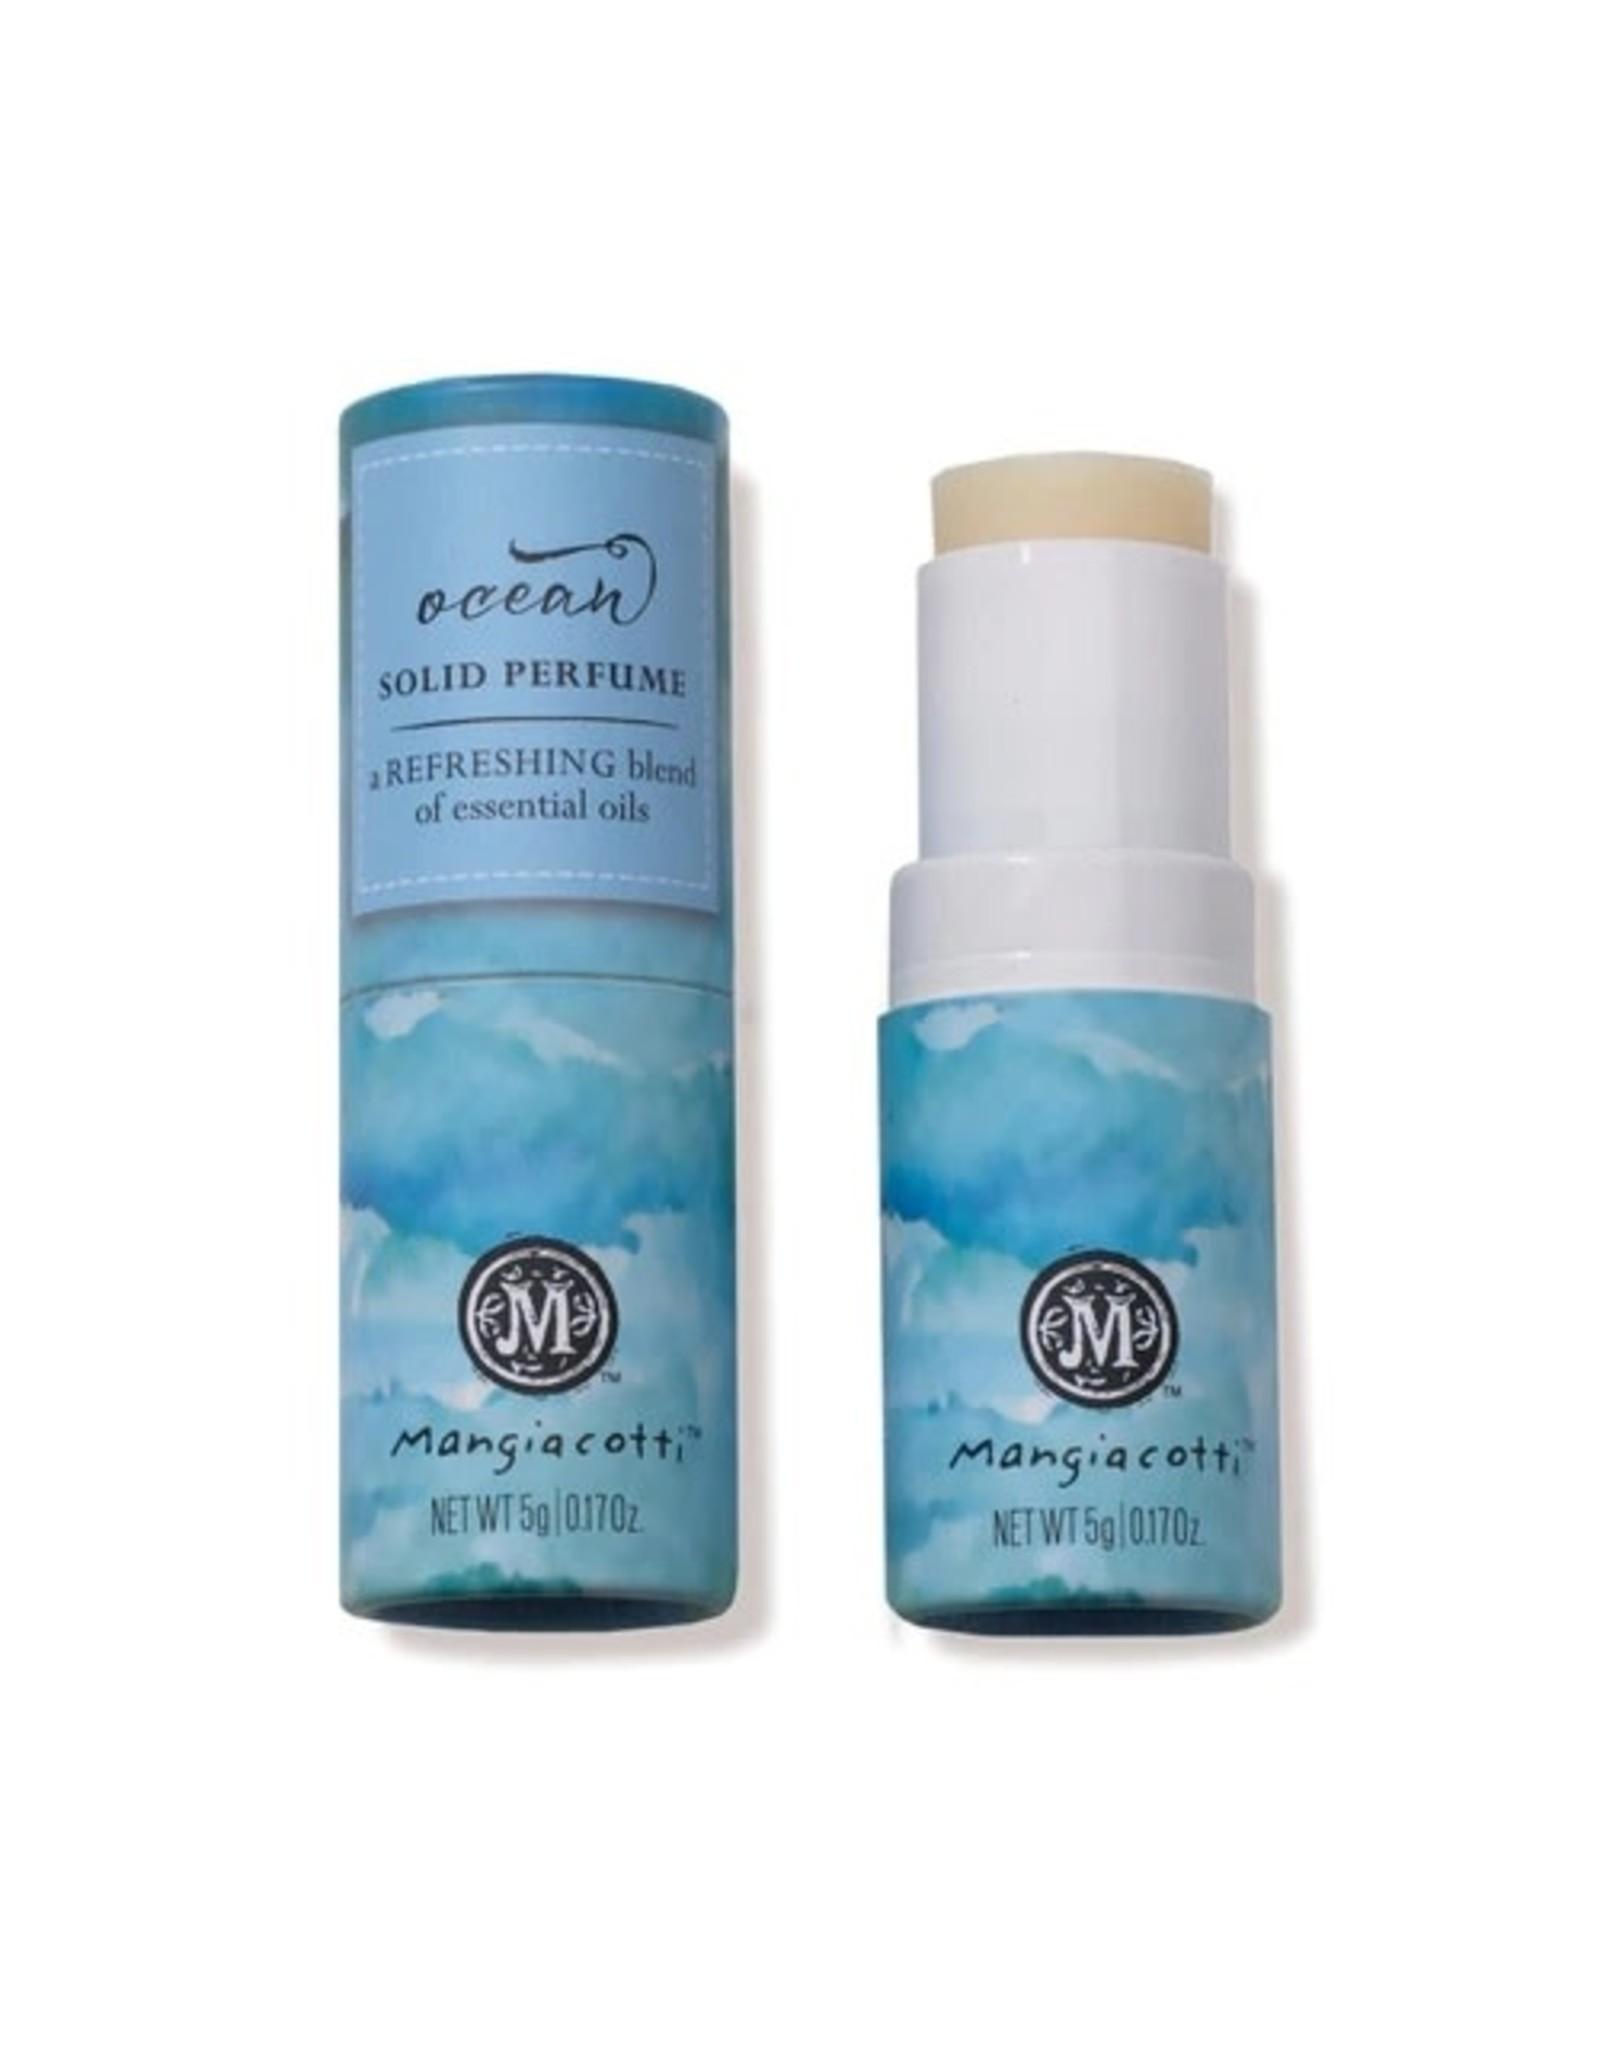 Mangicotti Mangiacotti Solid Perfume Ocean